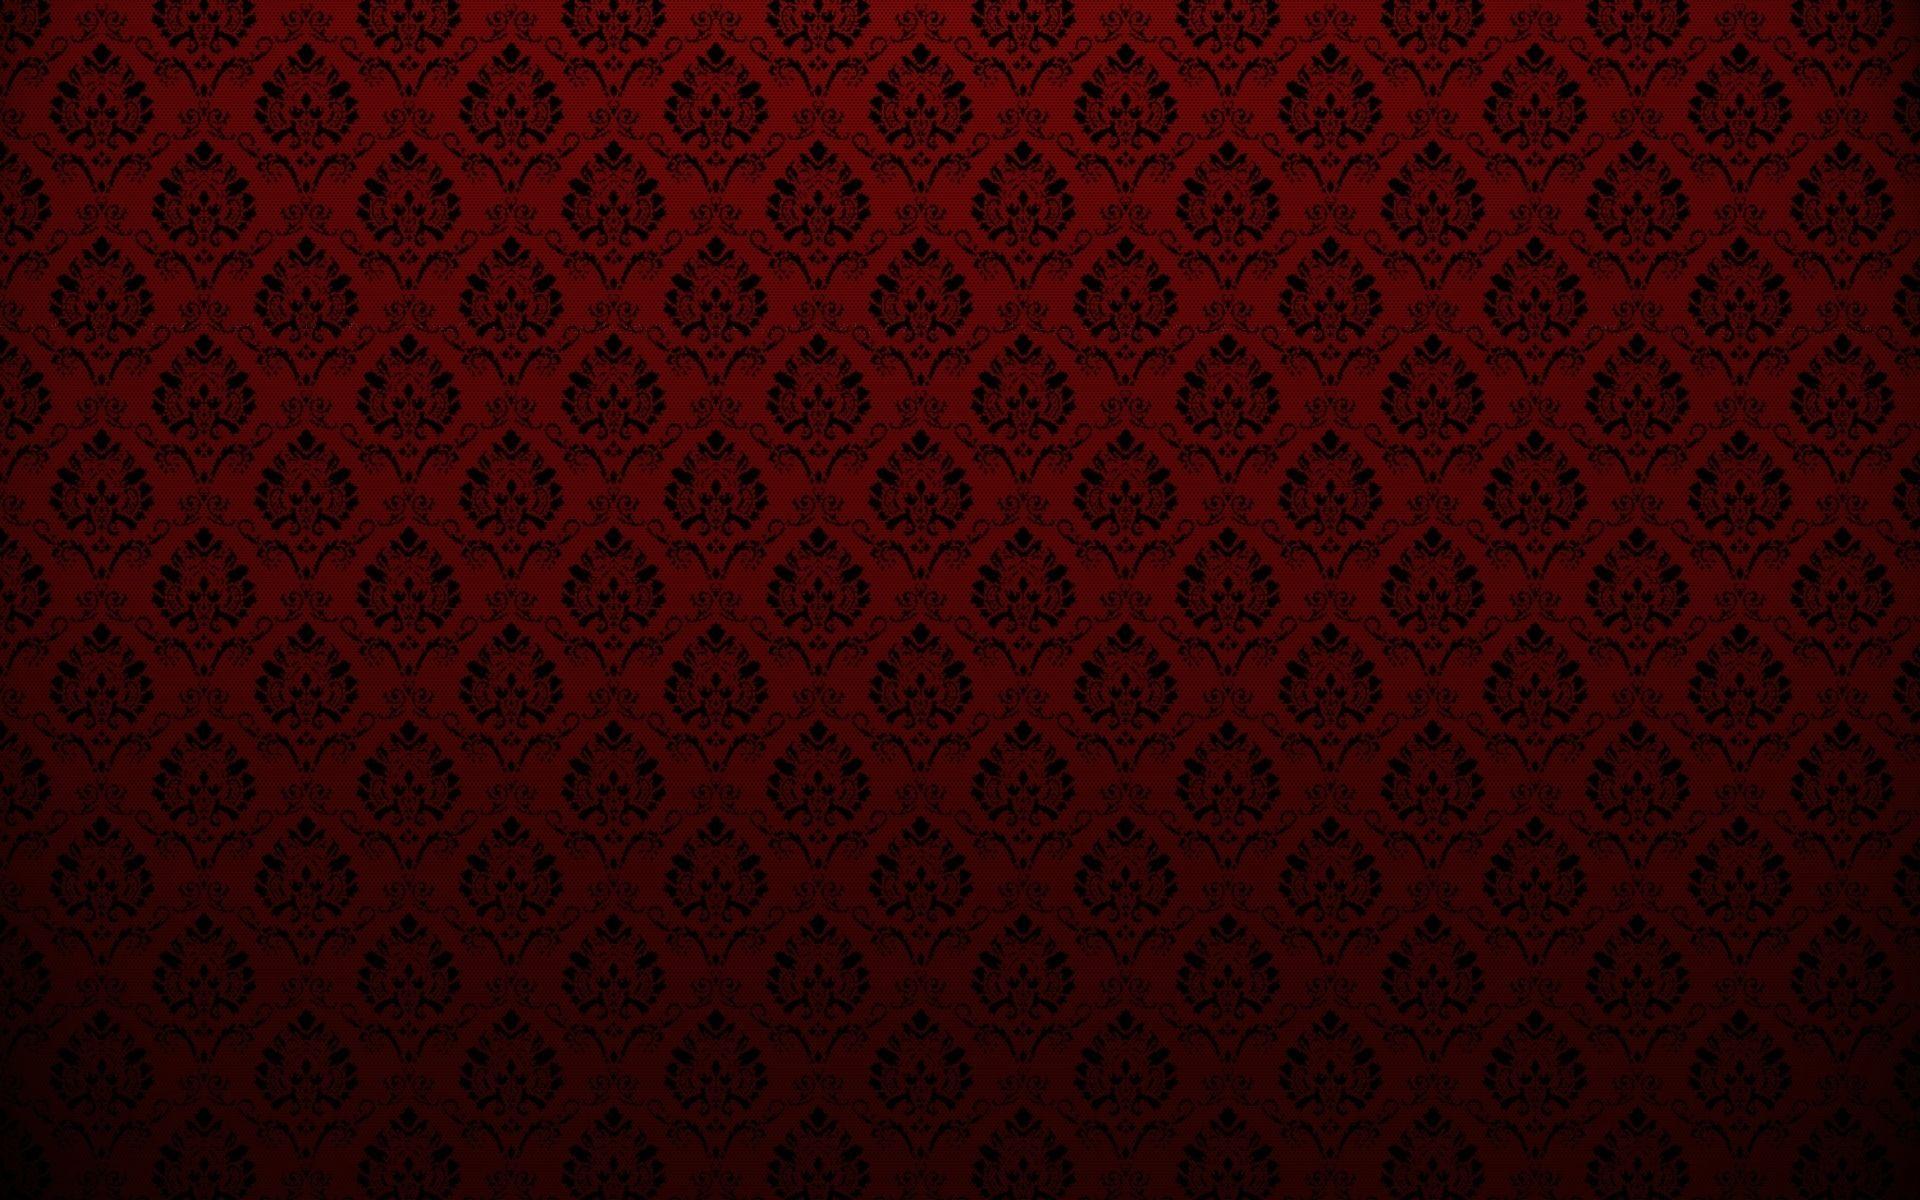 Dark Red Wallpapers Galaxy 1920x1200PX Wallpaper Dark Red 35618 1920x1200